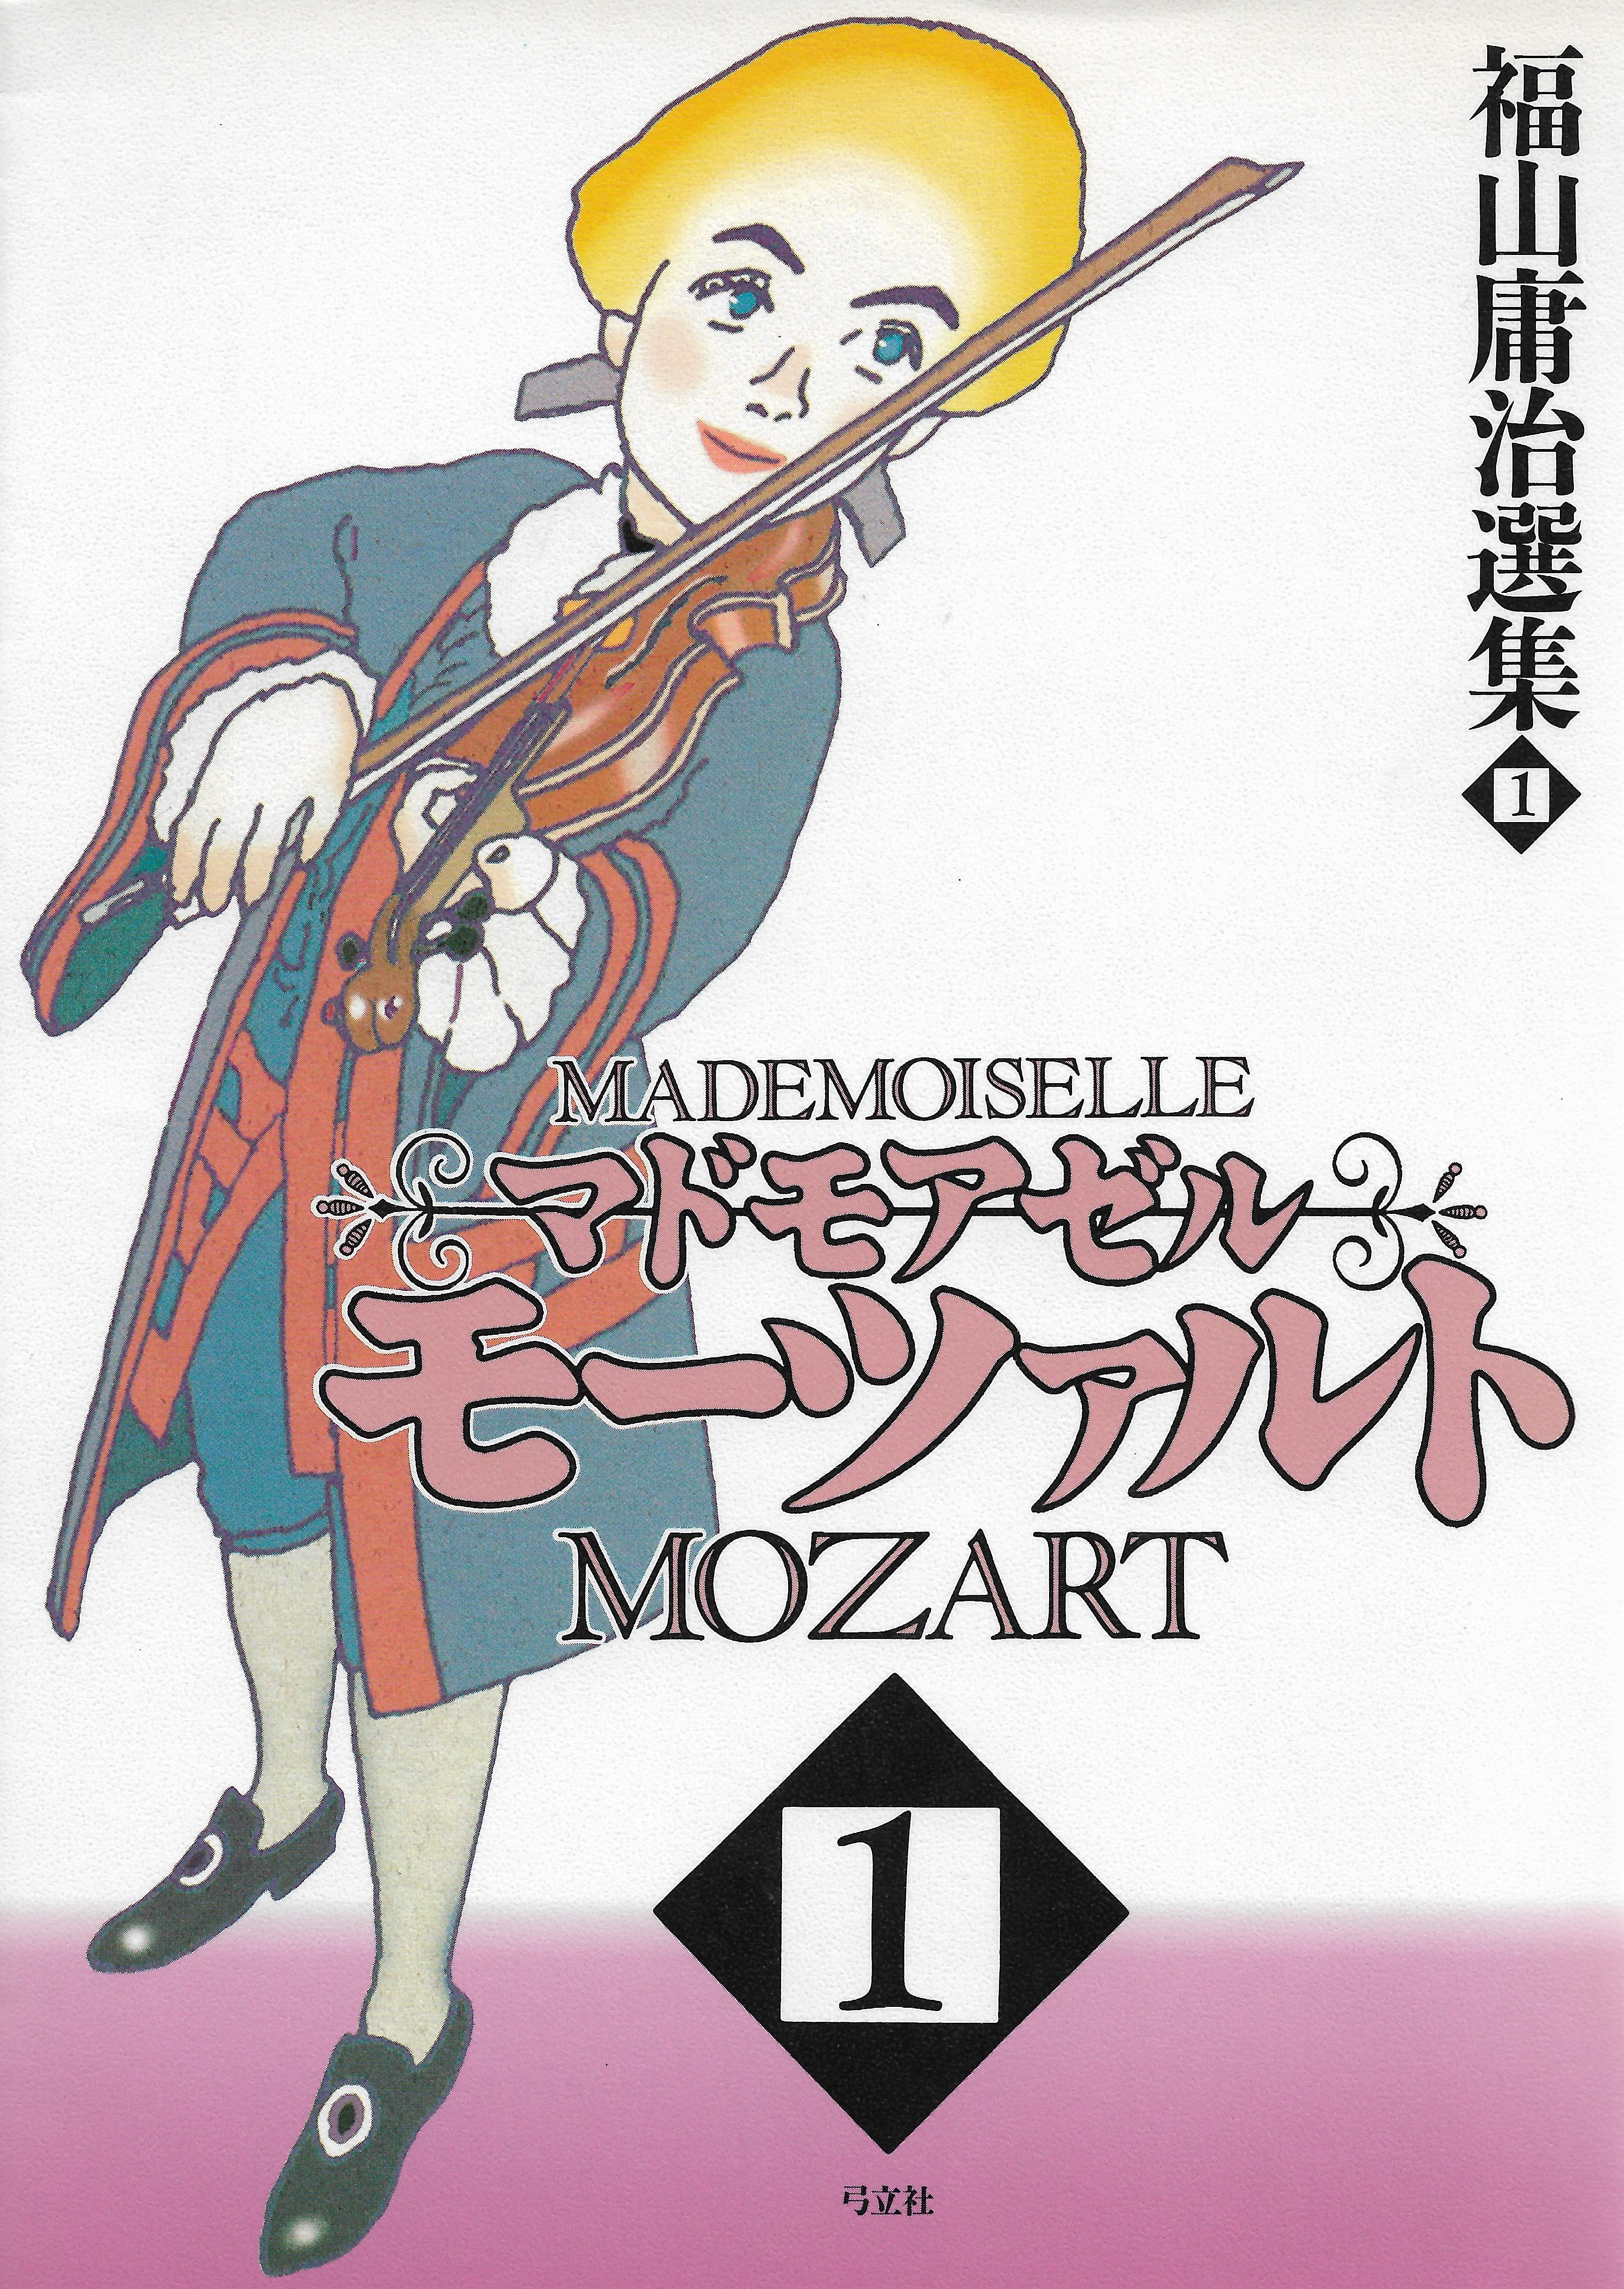 © Yoji Fukuyama. Titelbilder von Mademoiselle Mozart, Band 1 und 3. Tokyo: Yudachi-sha,1995.